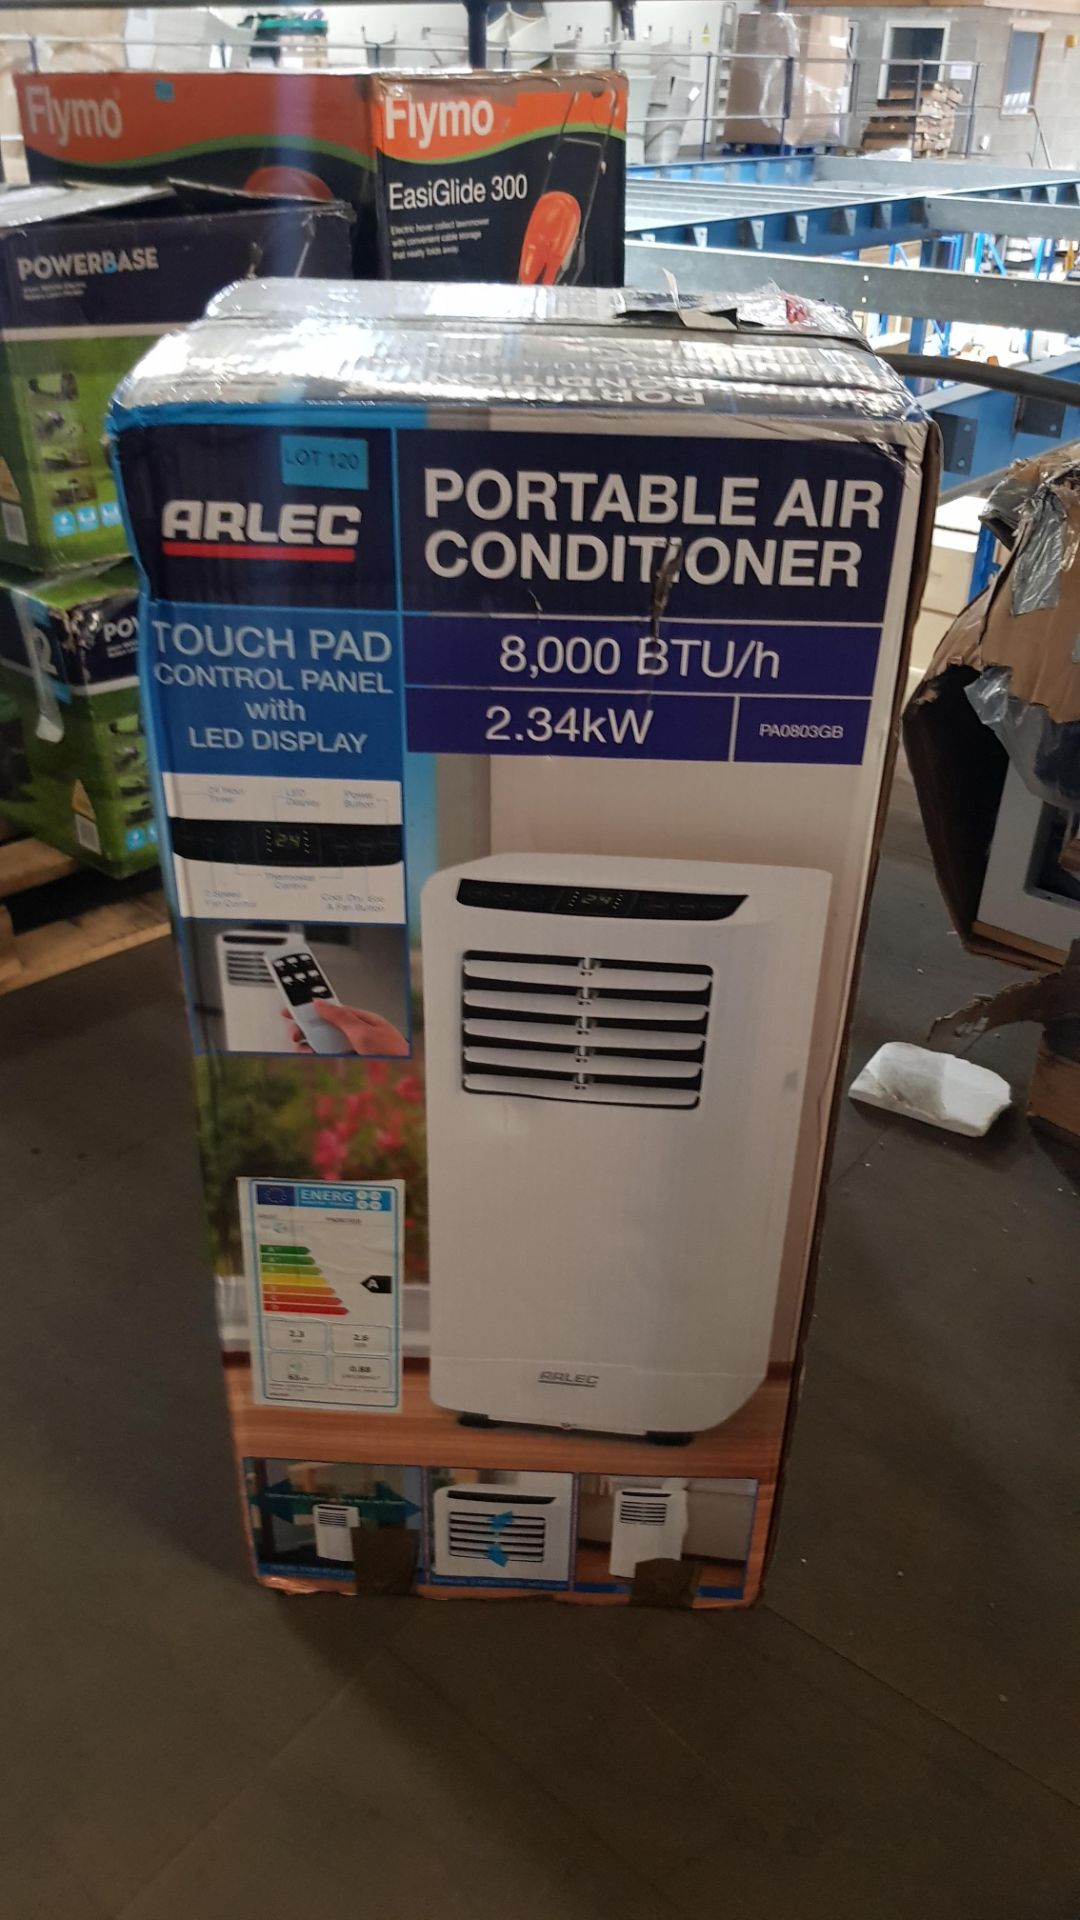 (P2) 1x Arlec Portable Air Conditioner 8000 BTU/h. RRP £400.00. - Image 3 of 3